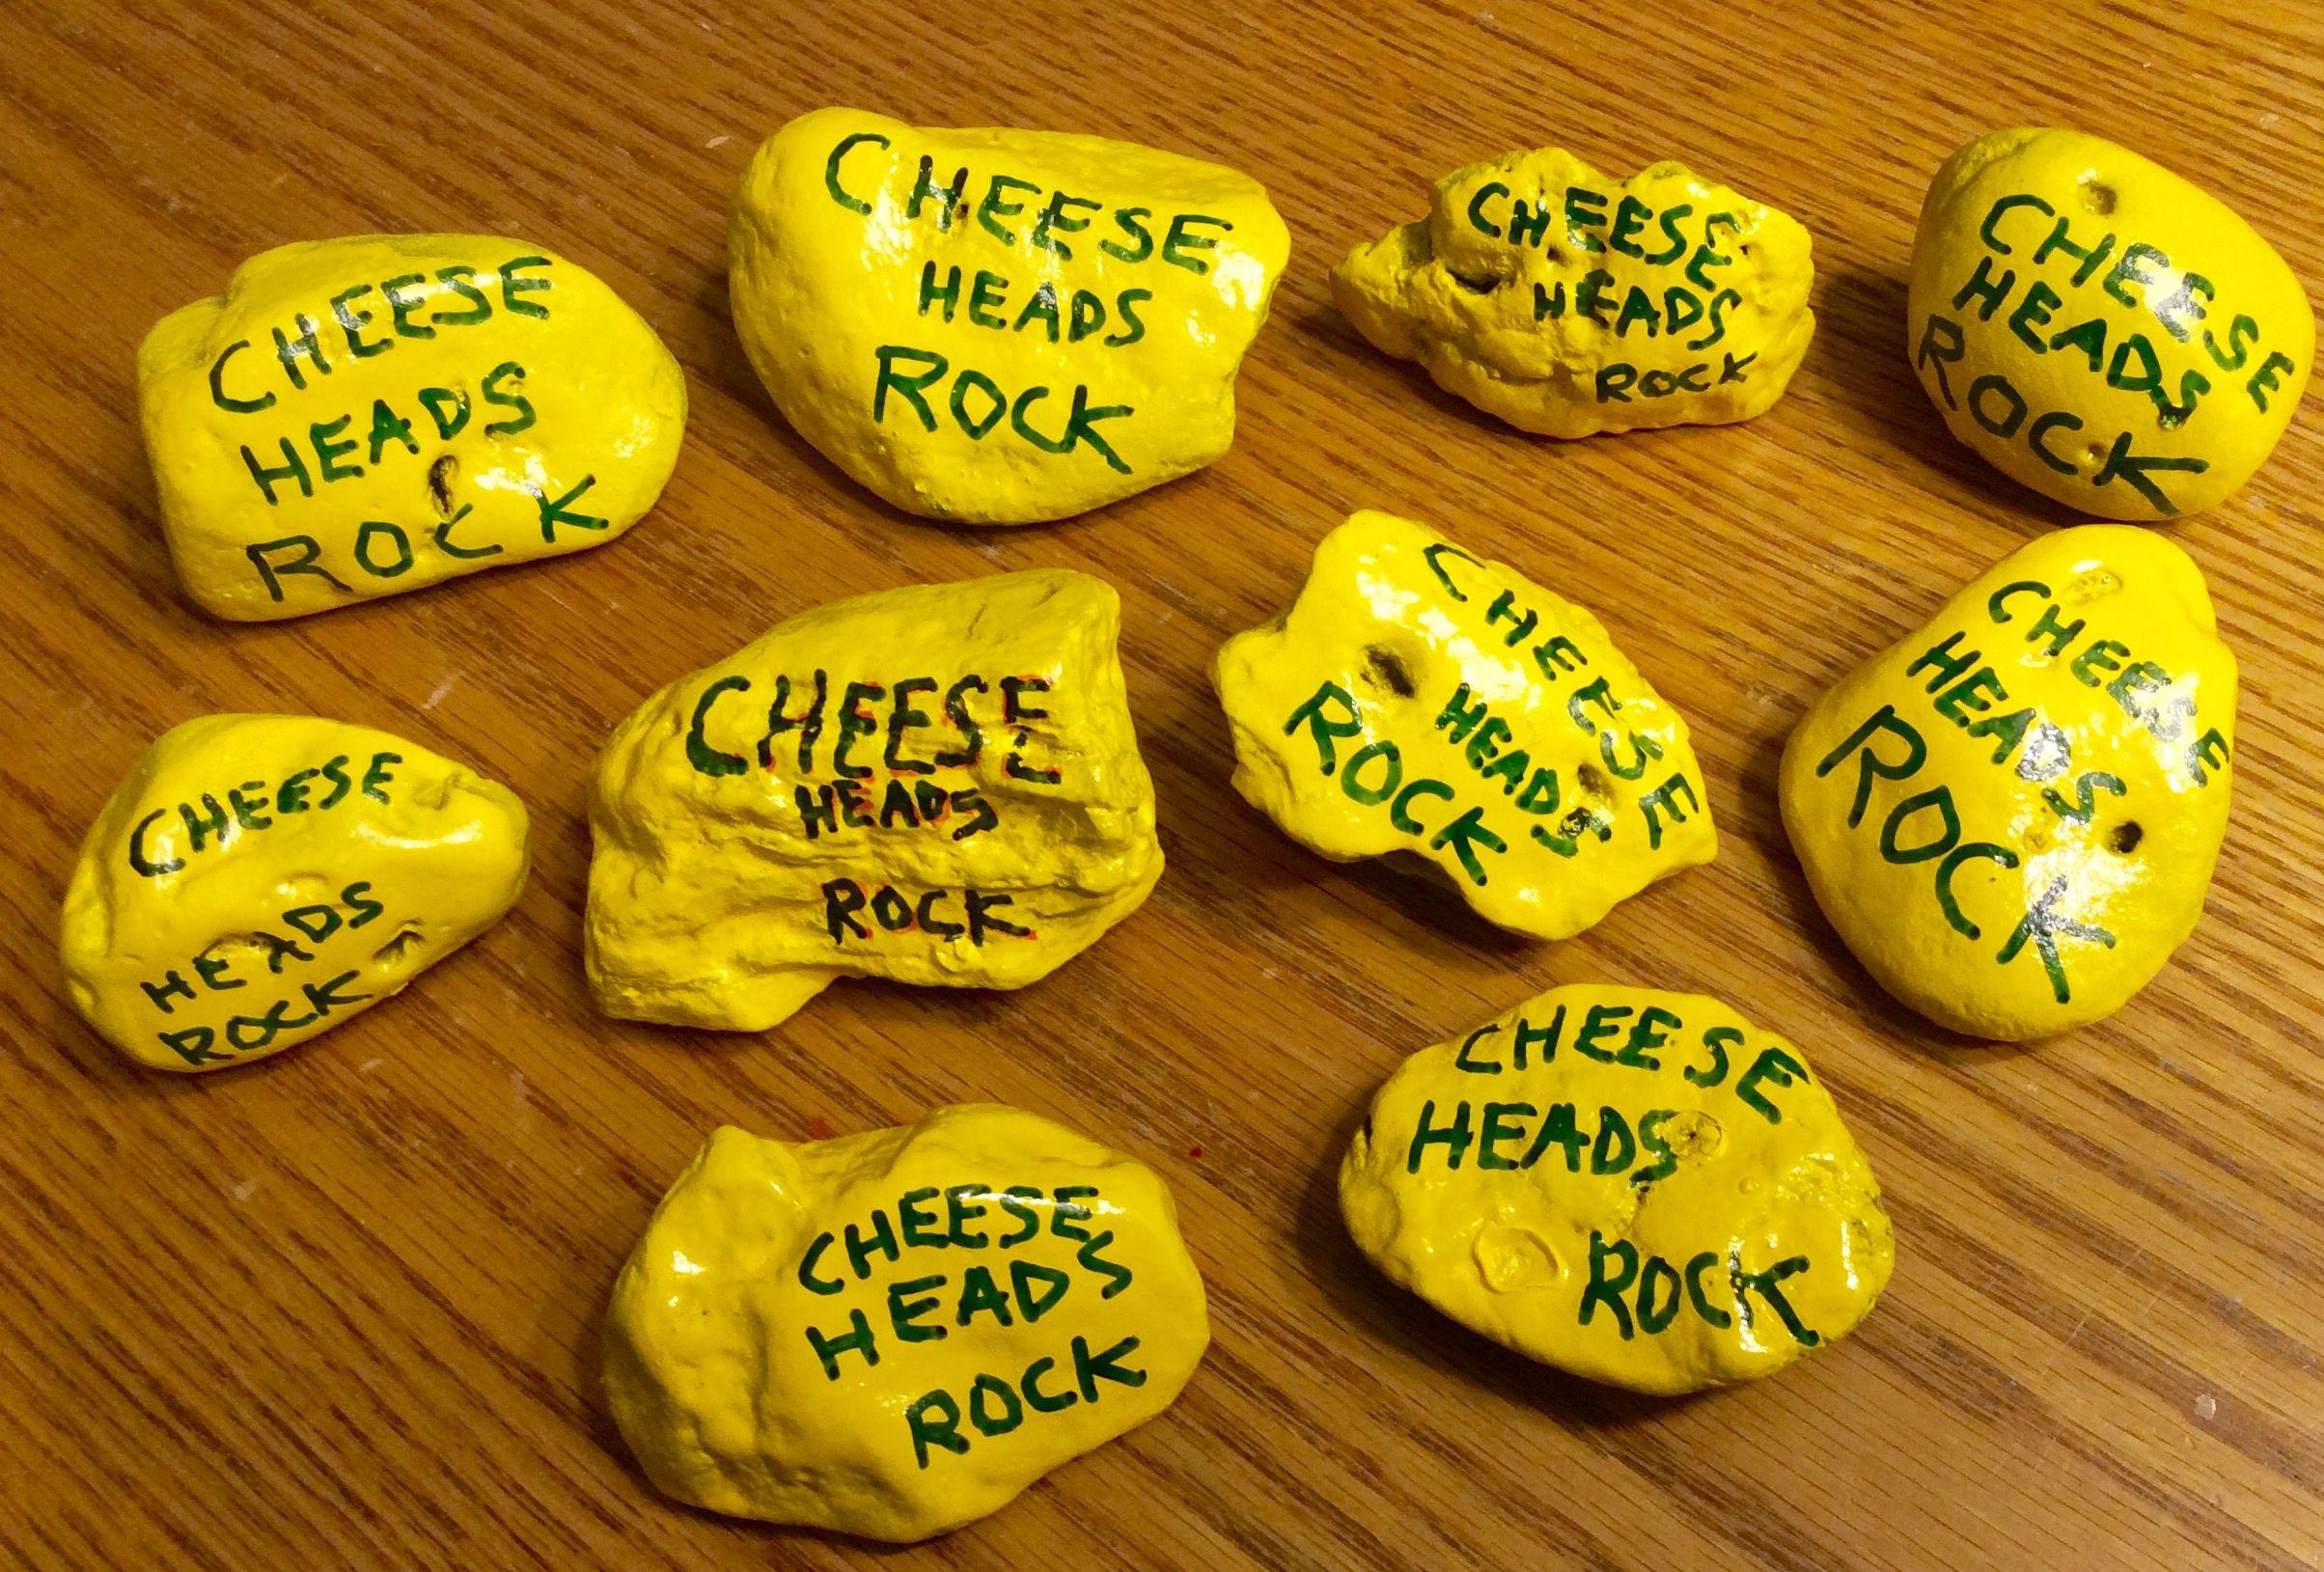 Green Bay Packers Cheesehead Painted Rocks Done By Holly N Painted Rocks Green Bay Packers Cheesehead Cheesehead